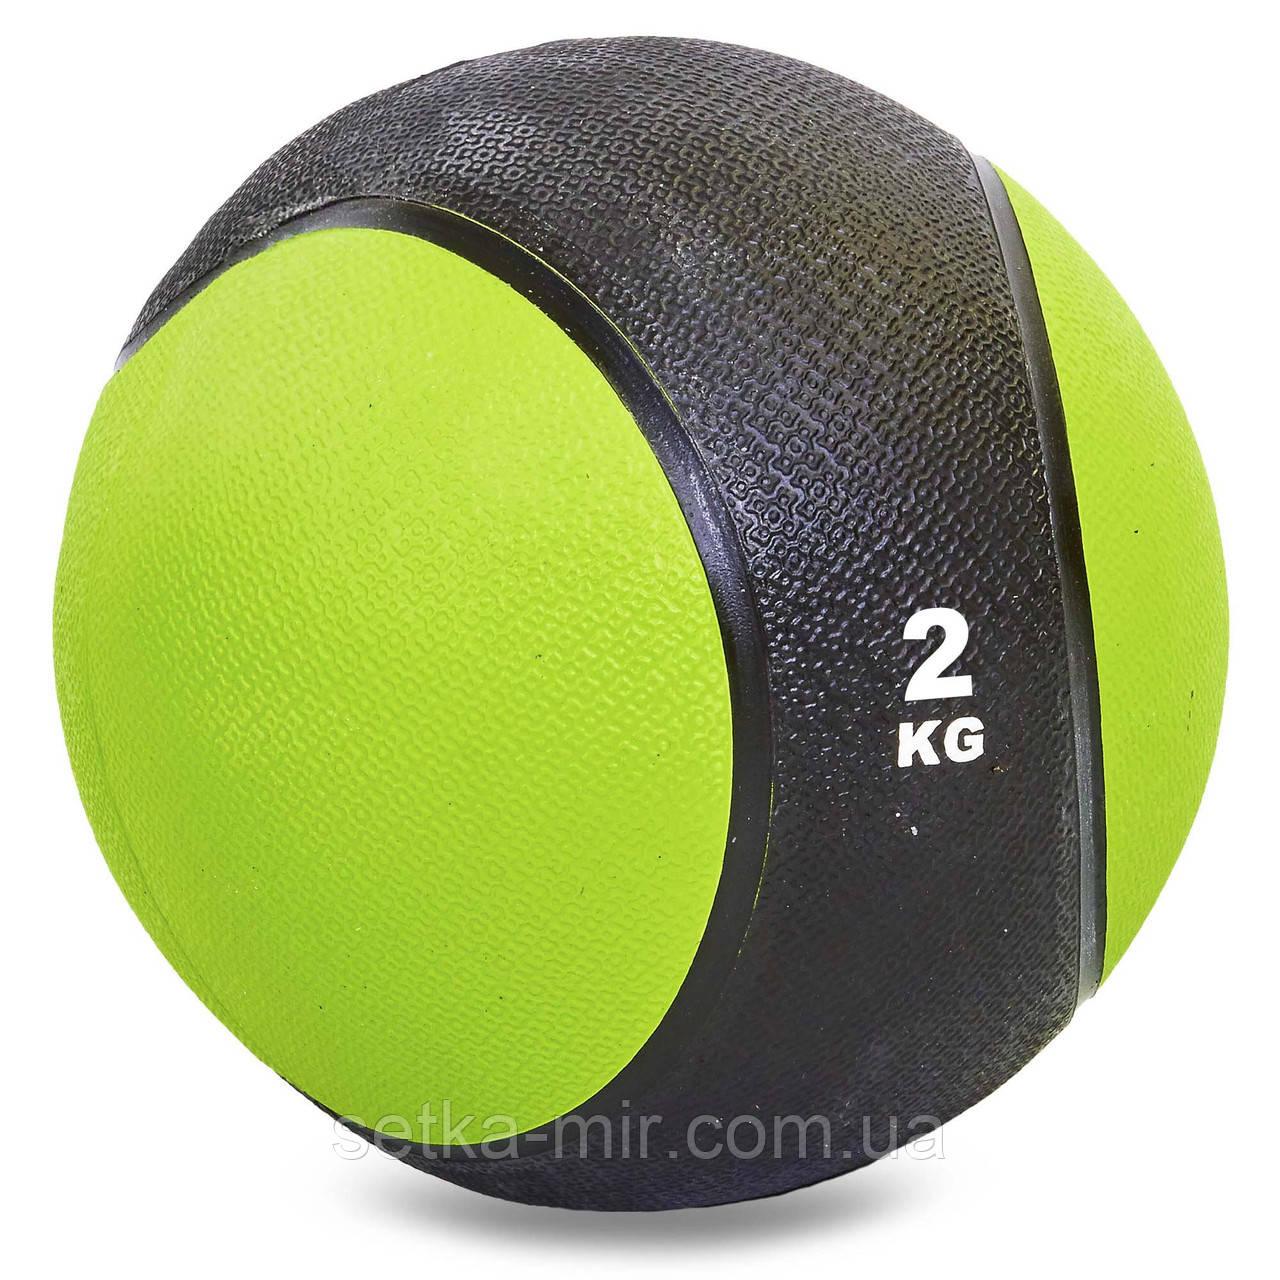 Мяч медицинский медбол Record Medicine Ball C-2660-2 2кг